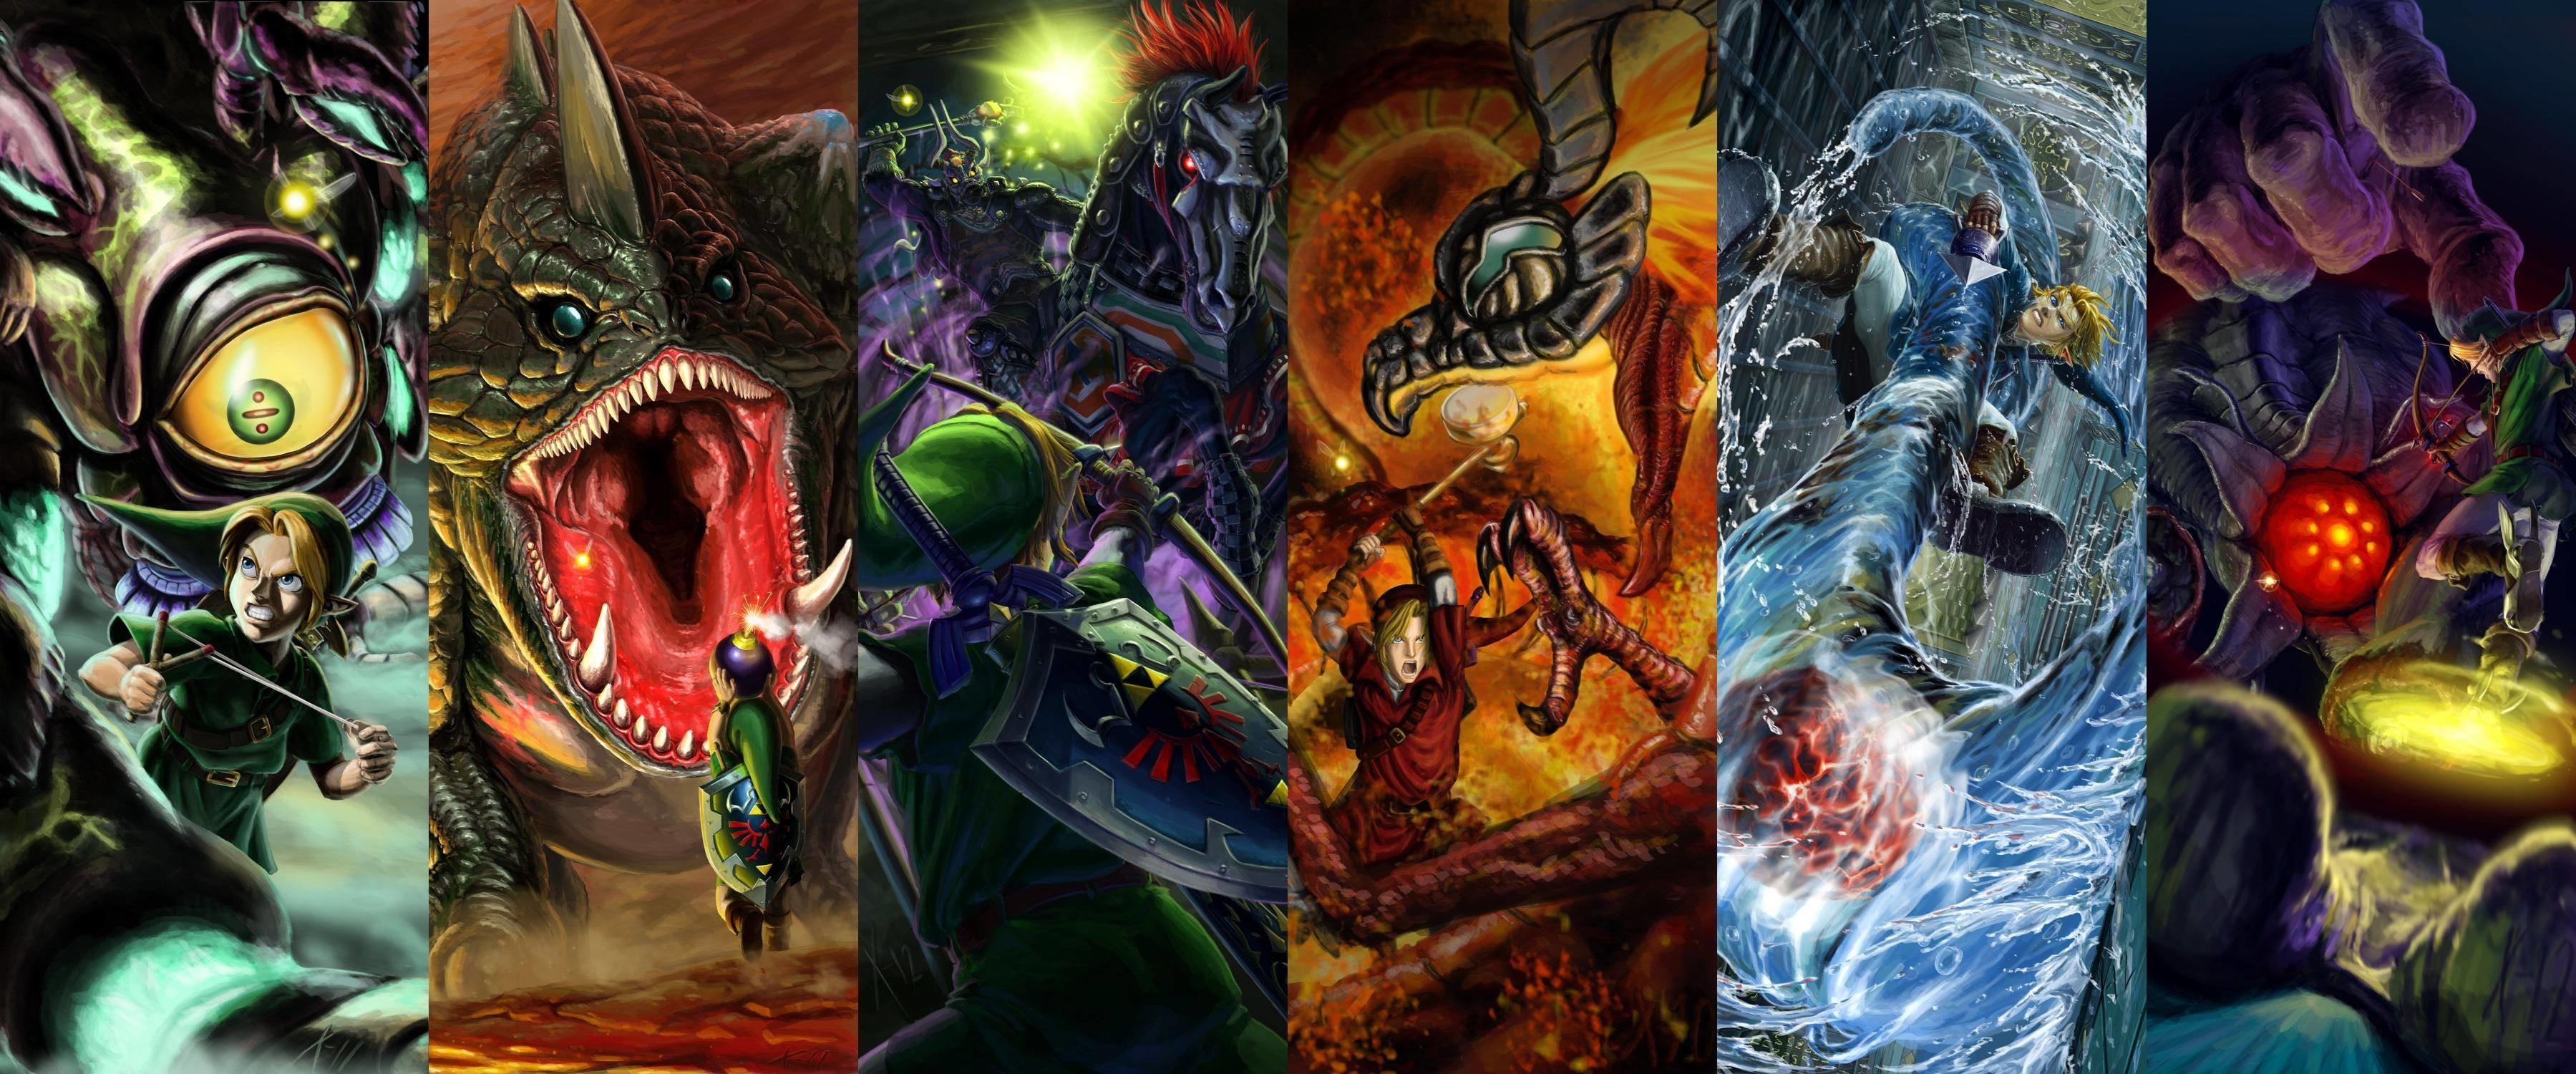 Video Game – The Legend Of Zelda: Ocarina Of Time Wallpaper